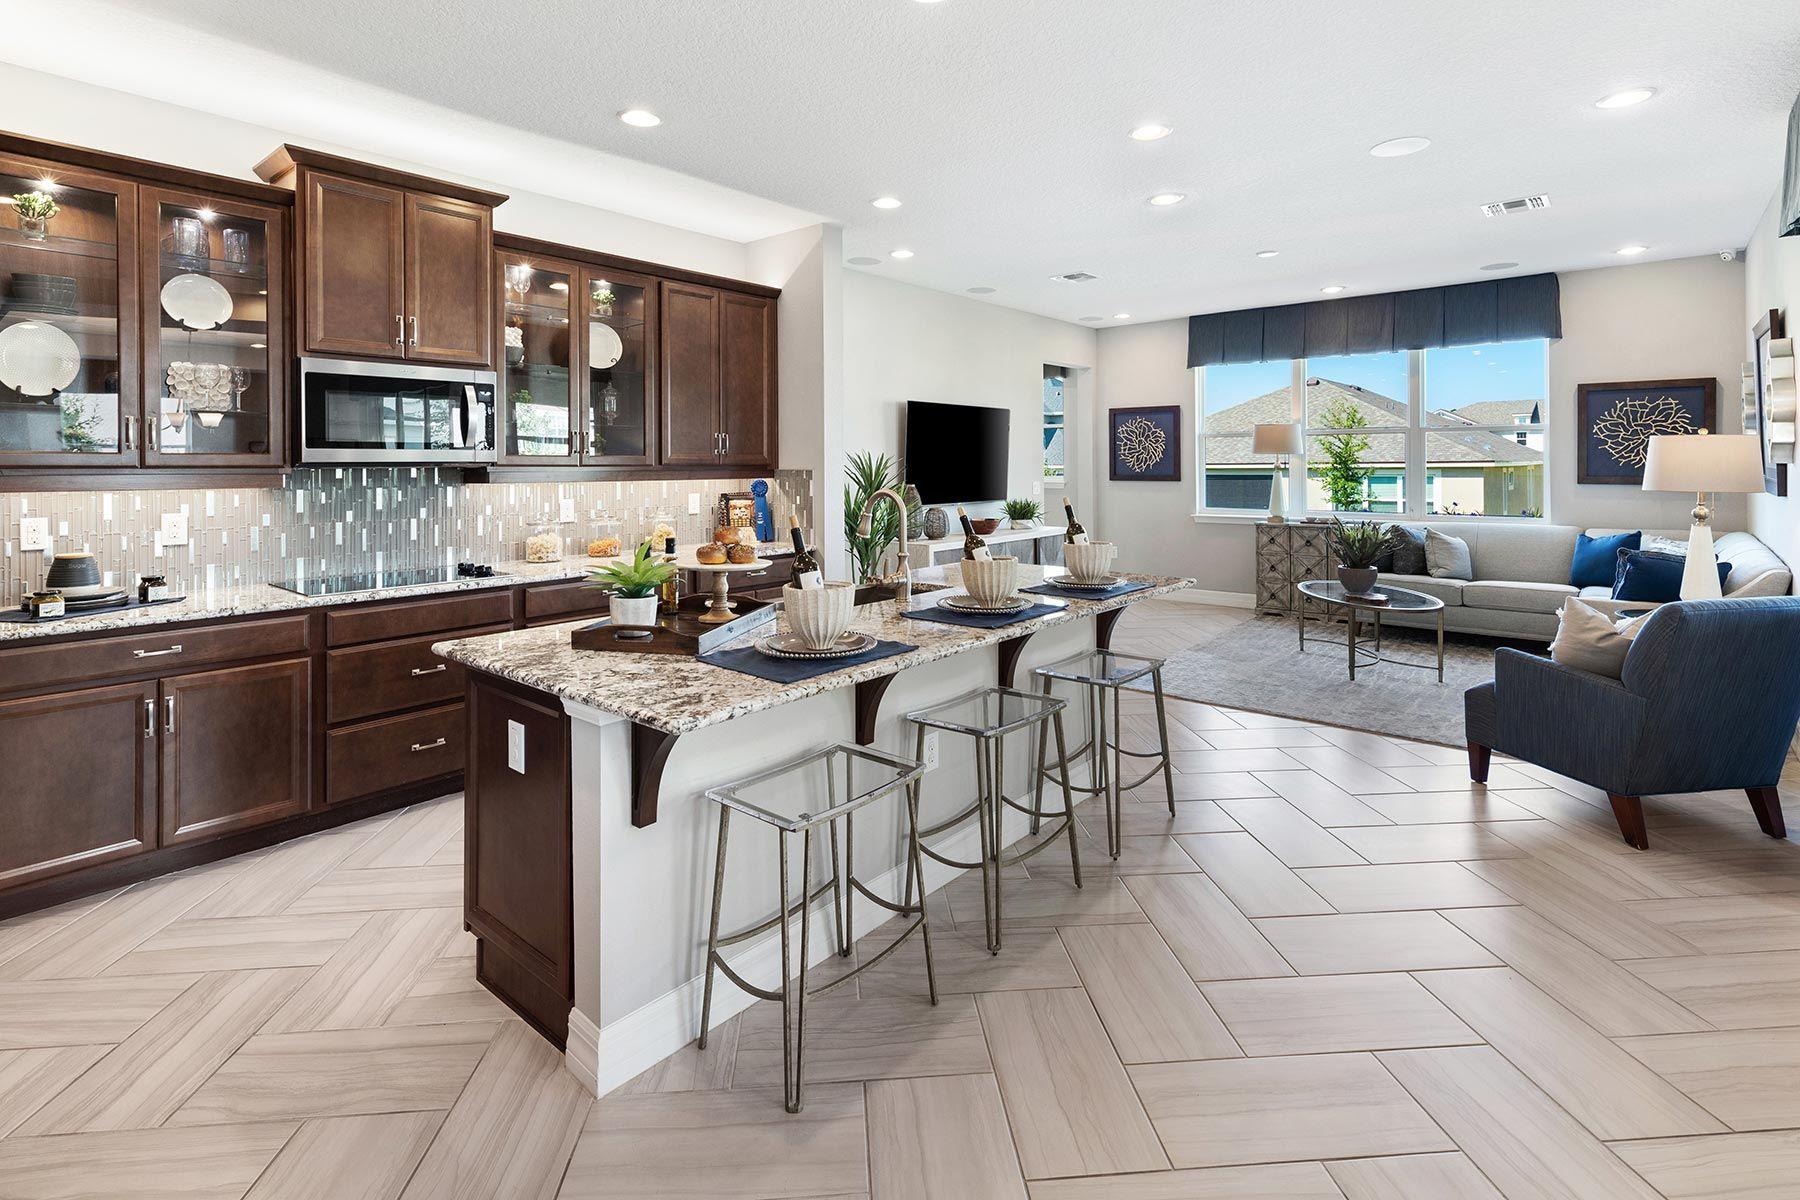 Kitchen featured in the Kensington By Mattamy Homes in Orlando, FL